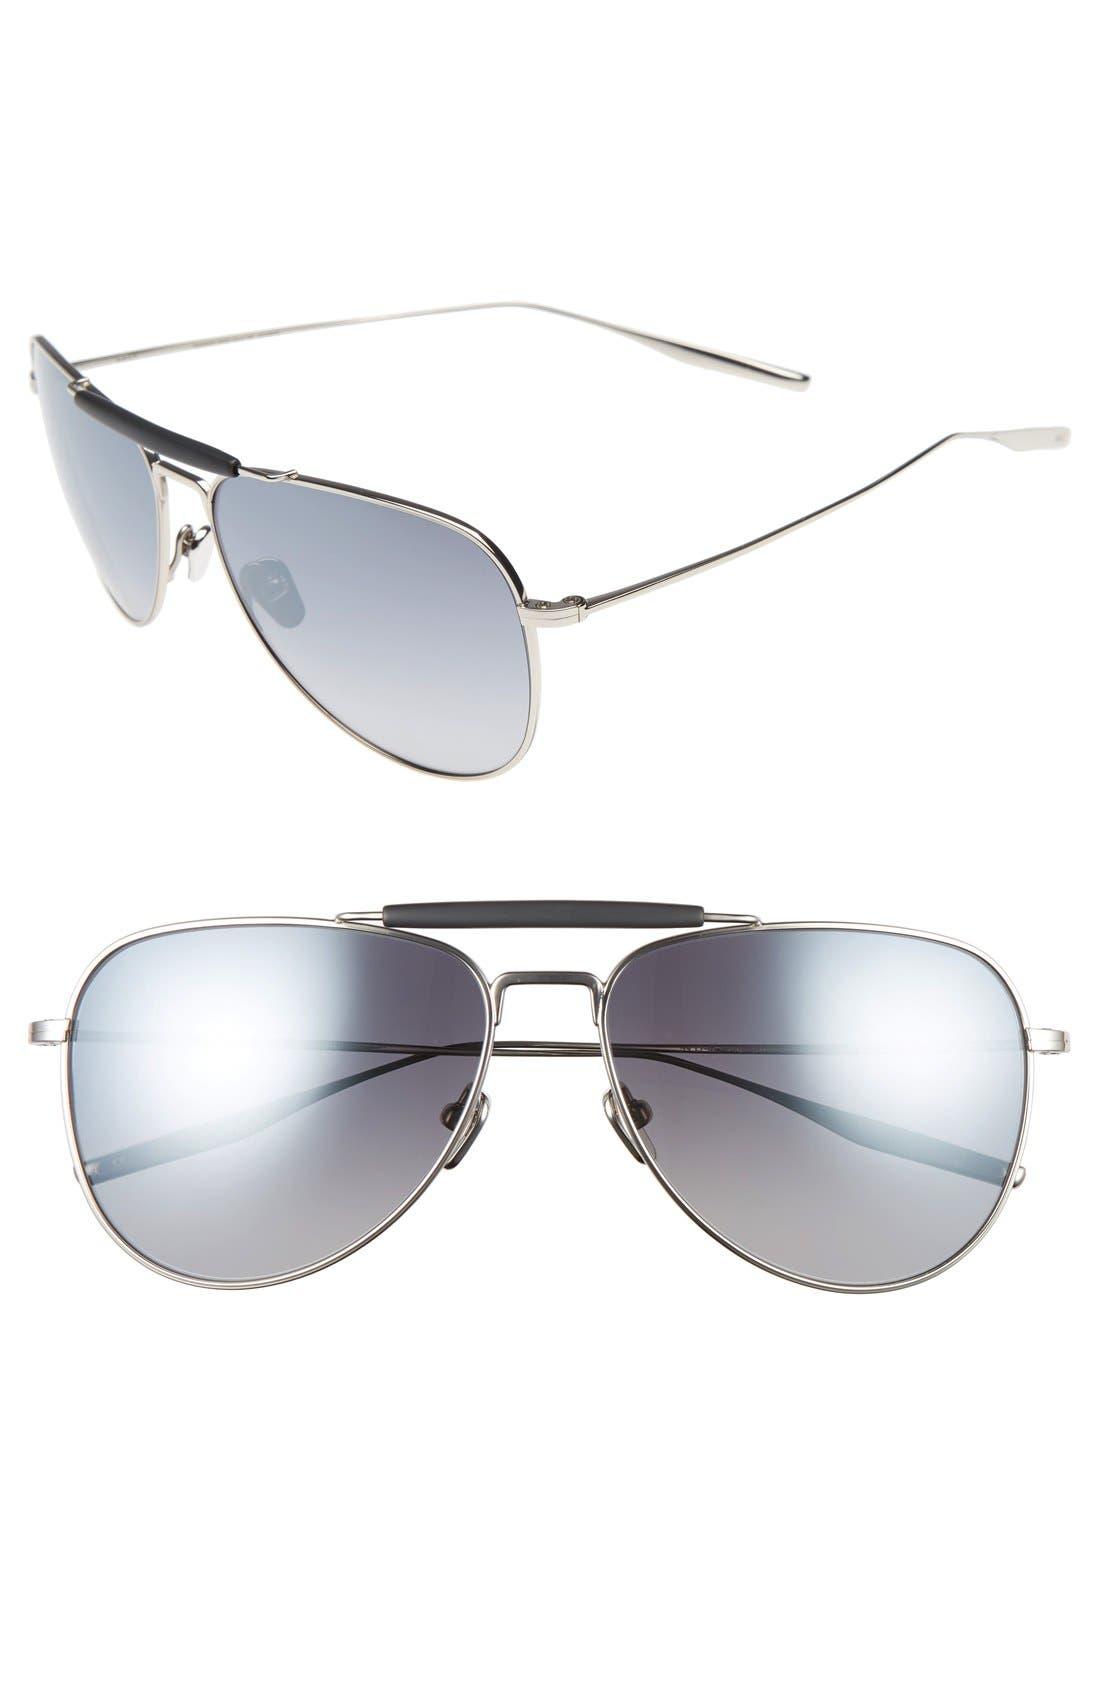 Main Image - SALT Striker 59mm Aviator Sunglasses